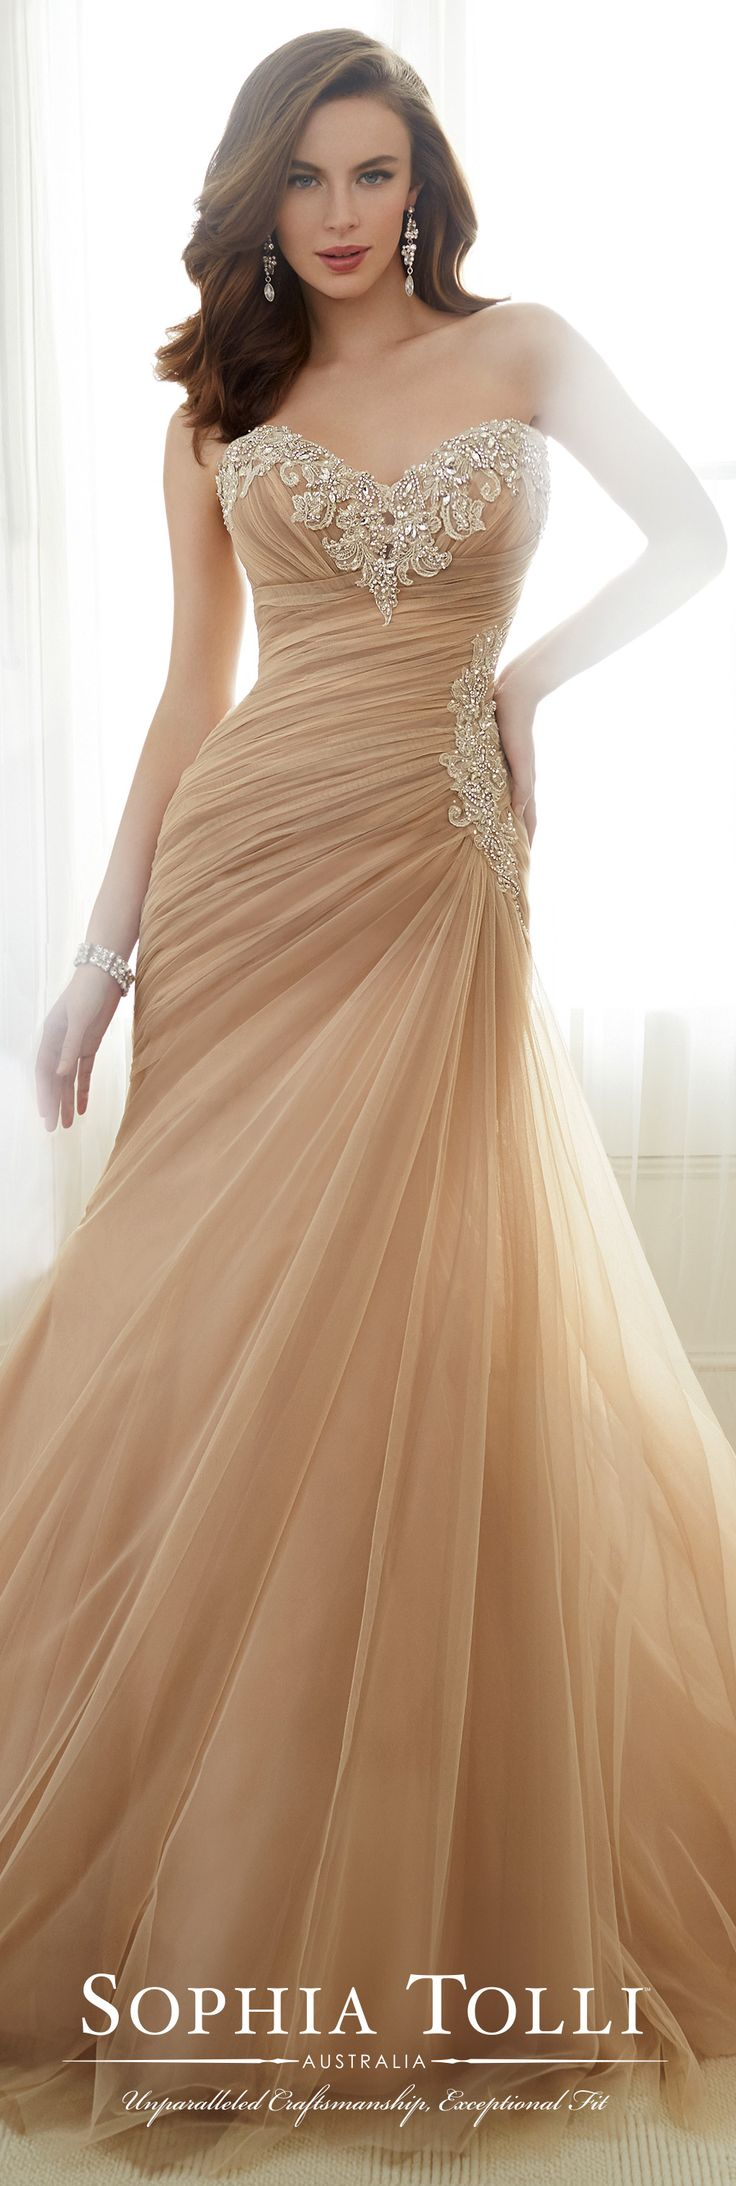 best ideas about sophia tolli wedding gowns sophia tolli spring 2017 wedding gown collection style no y11724 adeline asymmetrically draped